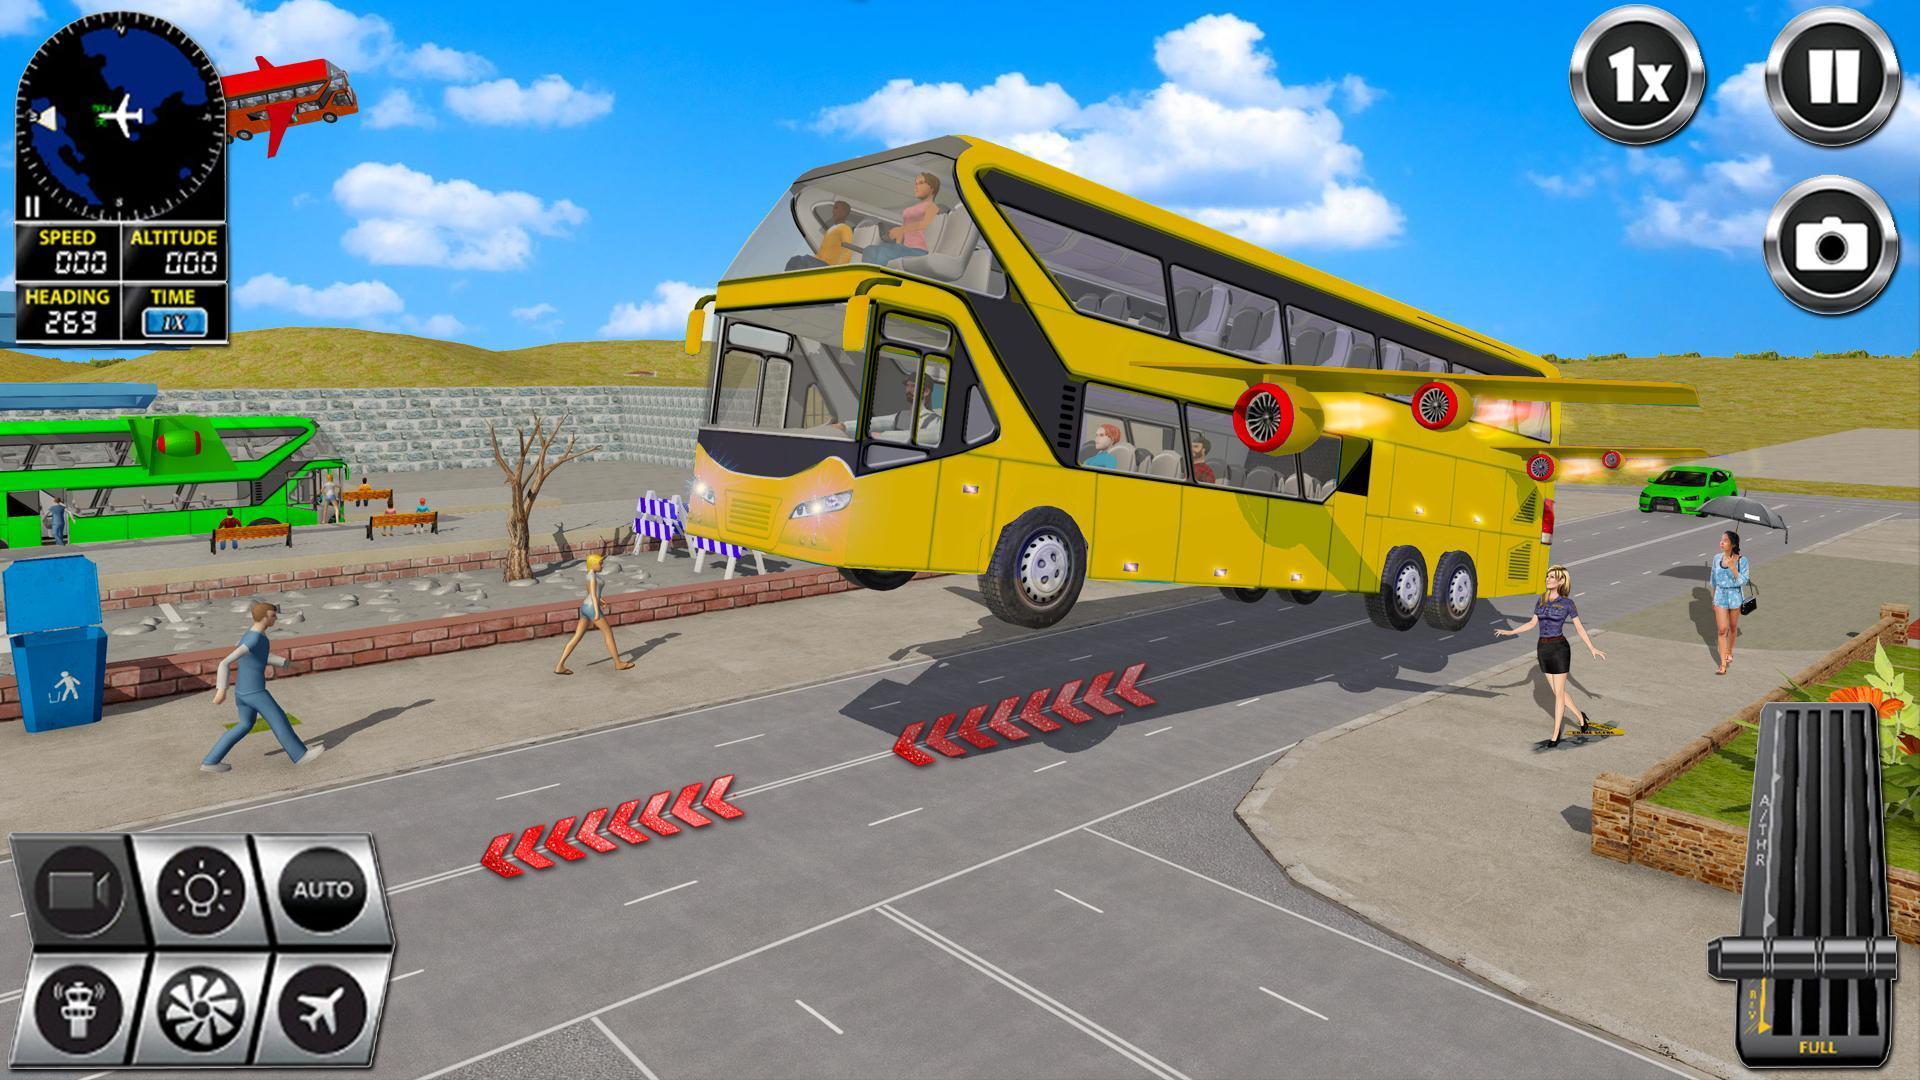 Flying Bus Driving simulator 2019: Free Bus Games 2.8 Screenshot 8